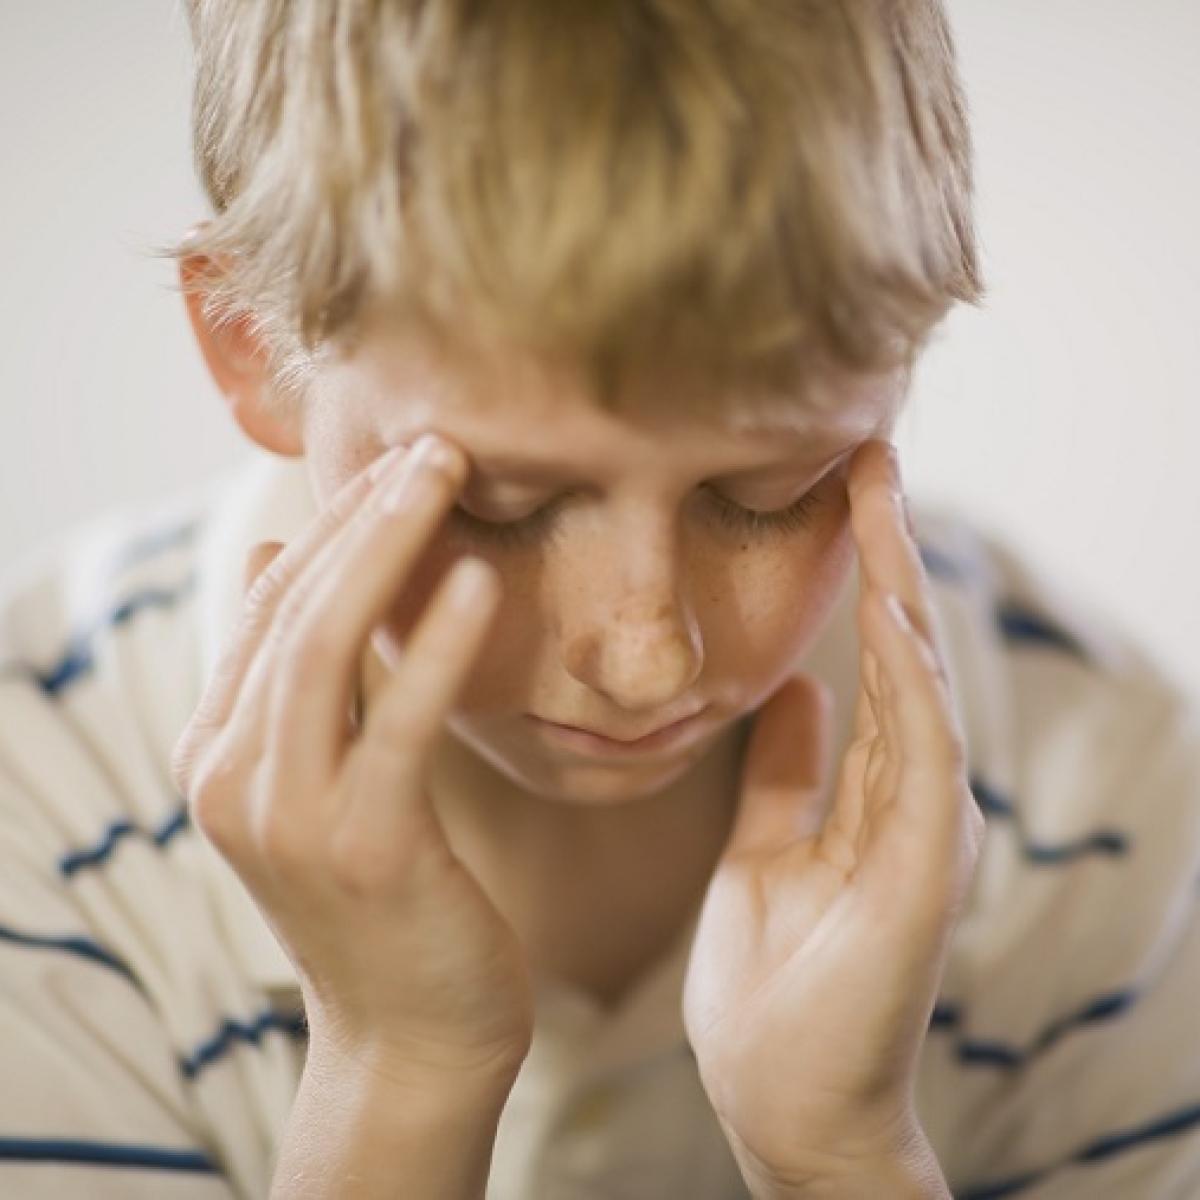 Understanding vertigo and balance disorders in children